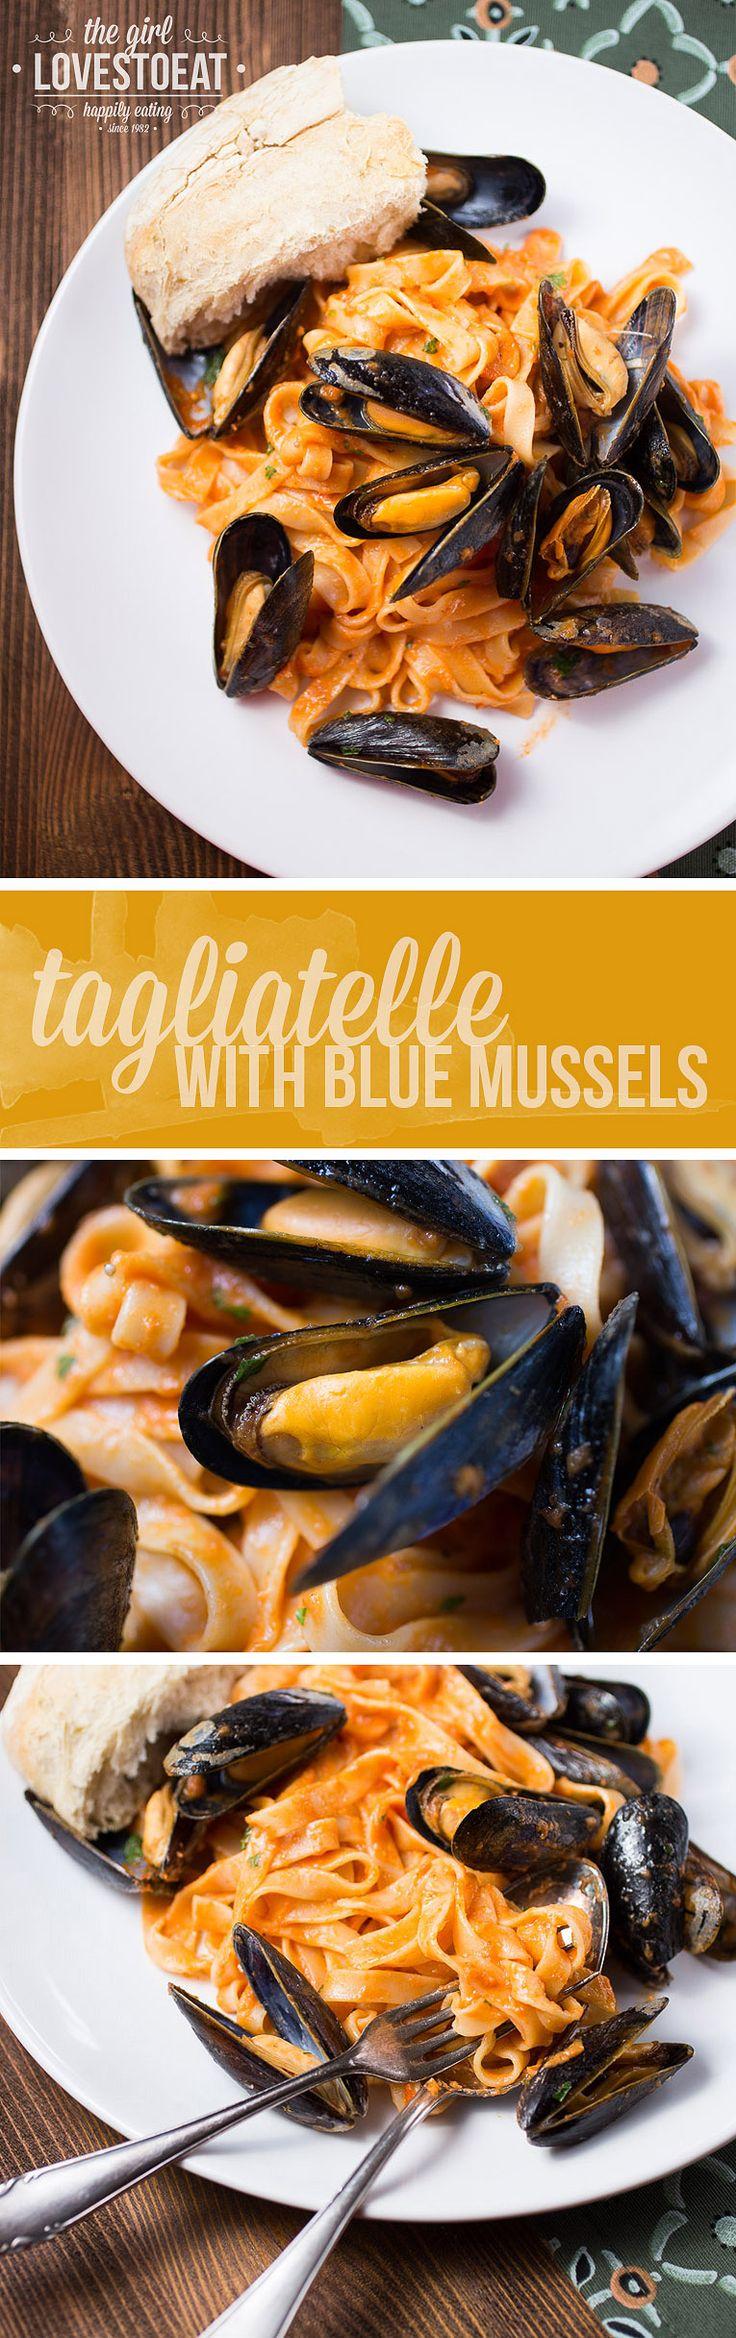 Tagliatelle with blue mussels {thegirllovestoeat.com}